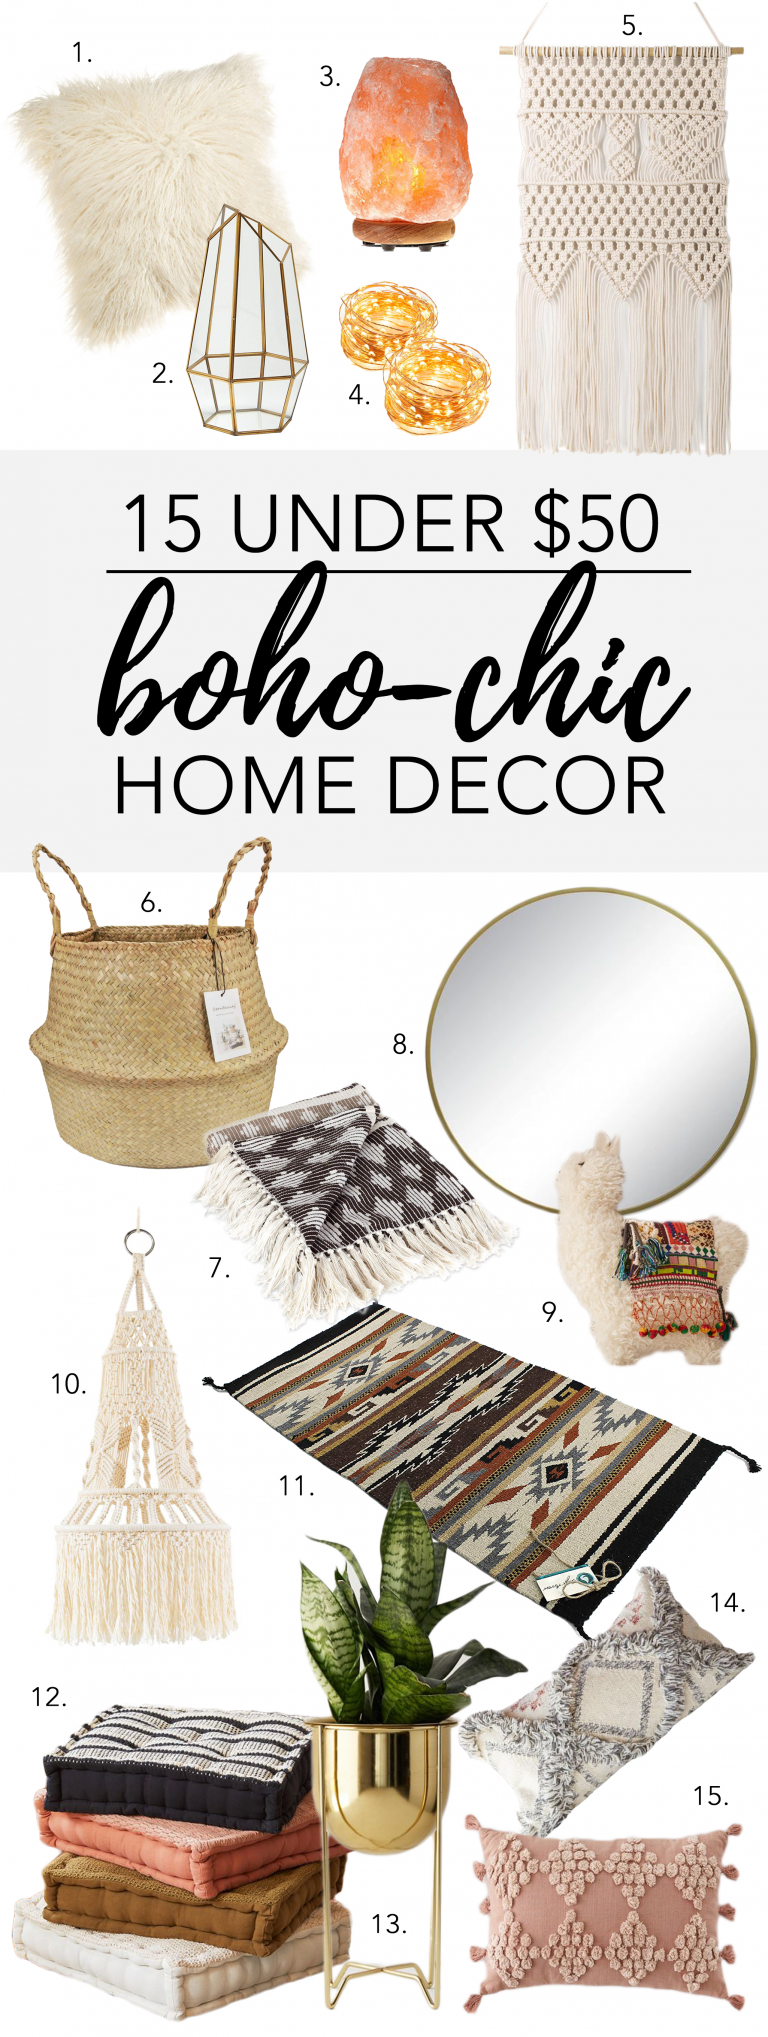 15 UNDER $50: BOHO-CHIC HOME DECOR images